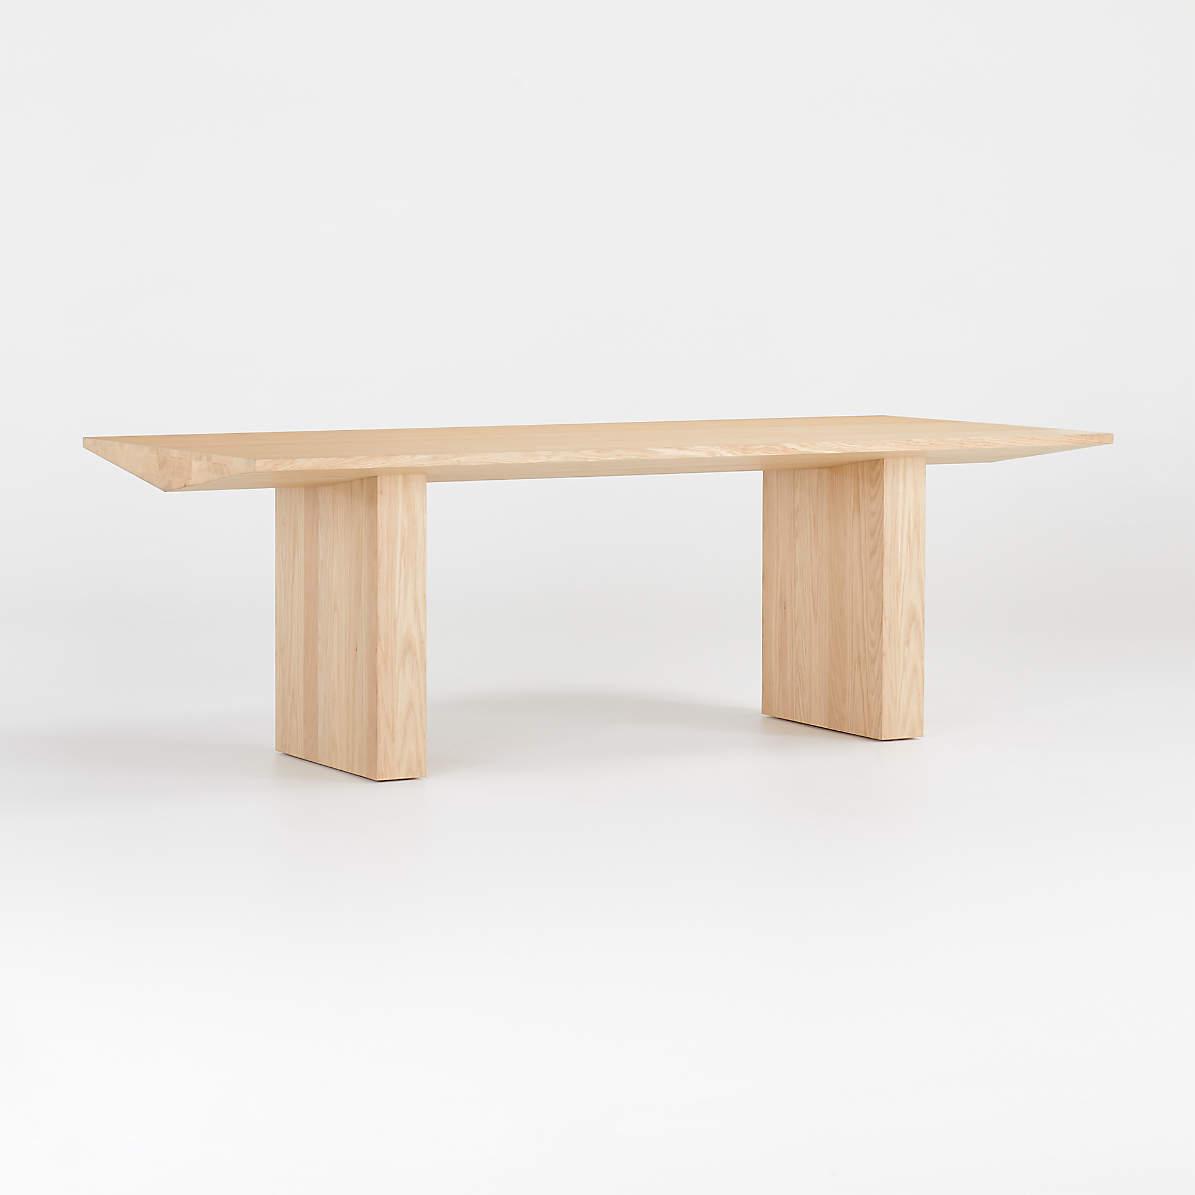 Van Natural Wood Dining Table + Reviews   Crate and Barrel Canada